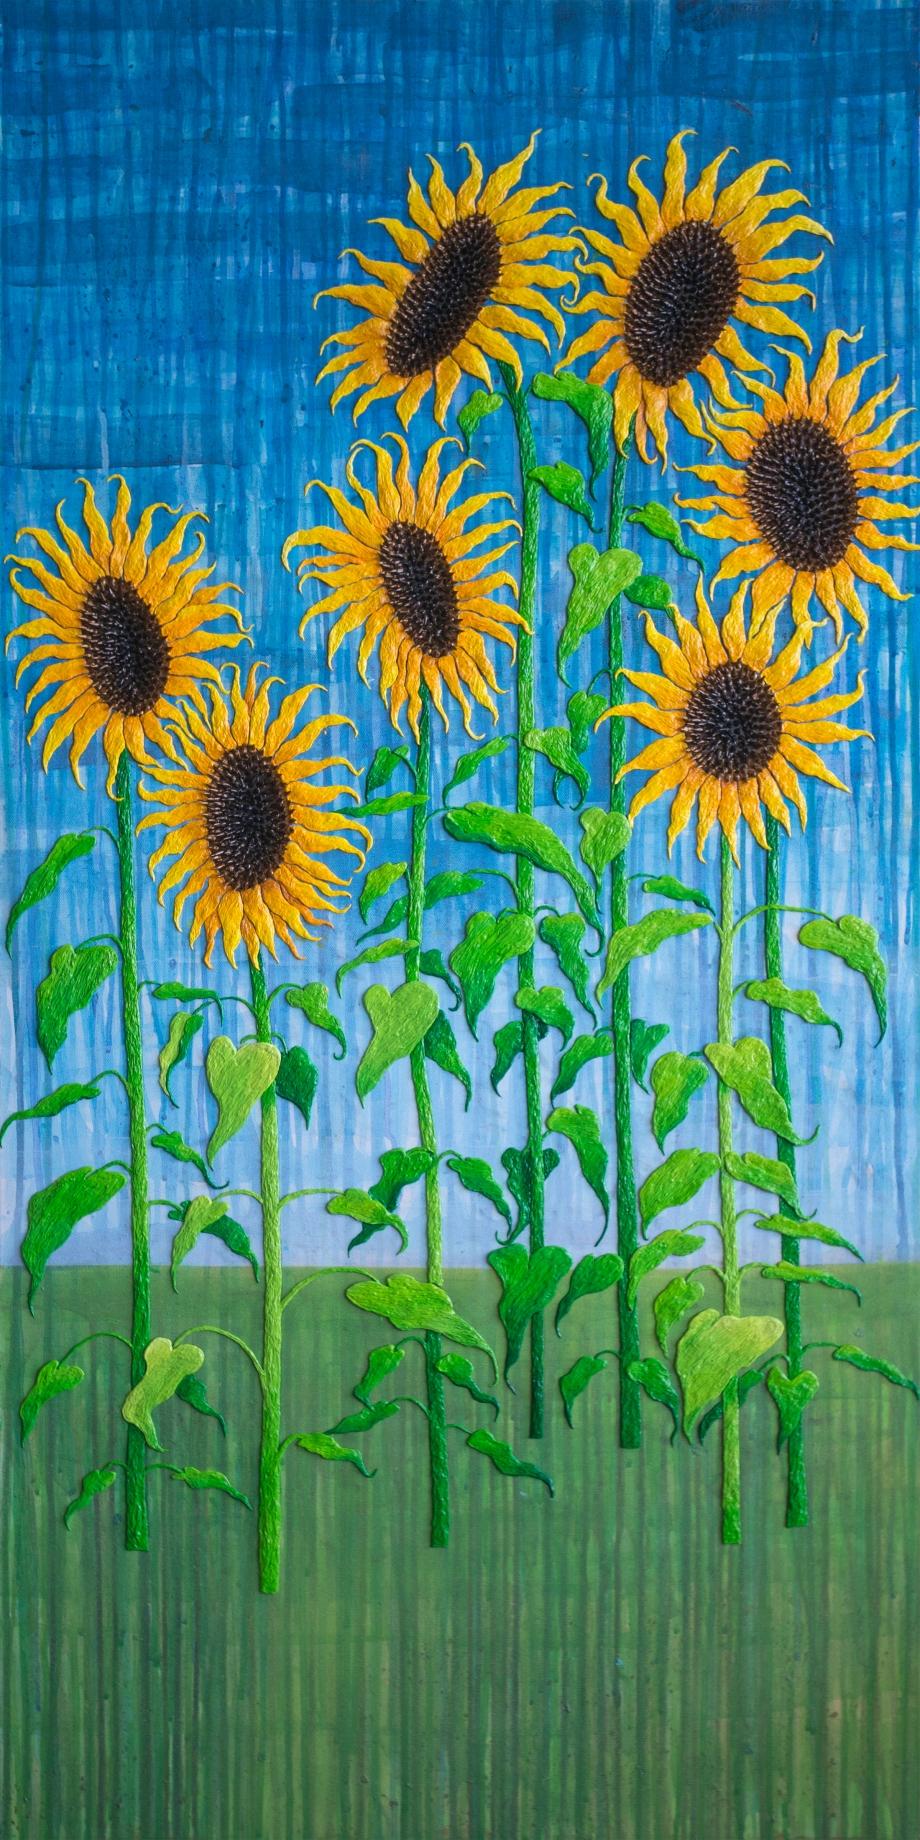 7 Lucky Sunflowers (All Grown Up)